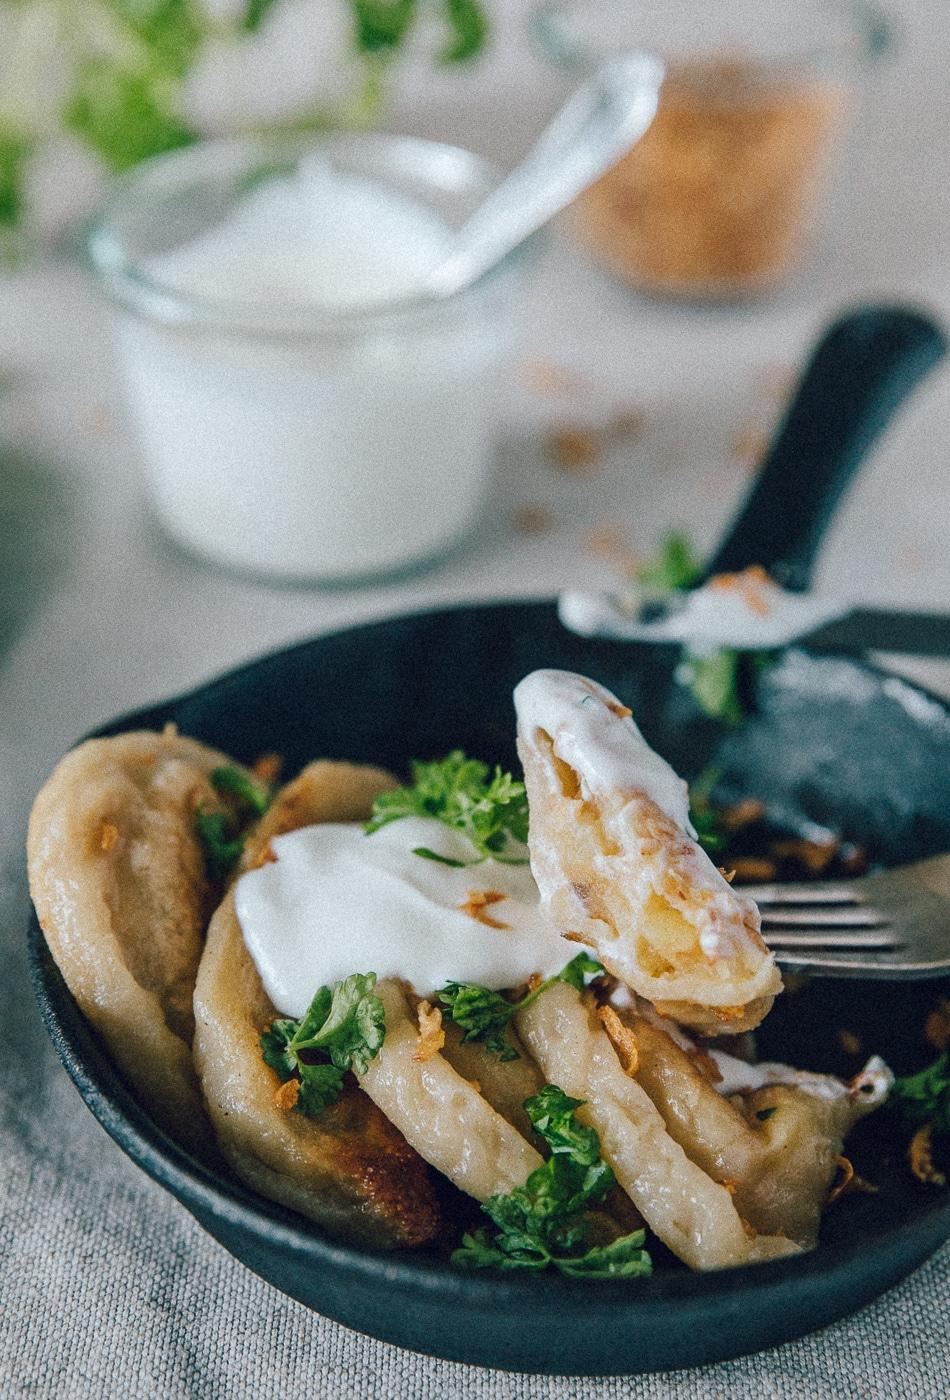 russiske vareniki, kartoffelmos, fryseegnet mad, ristede løg